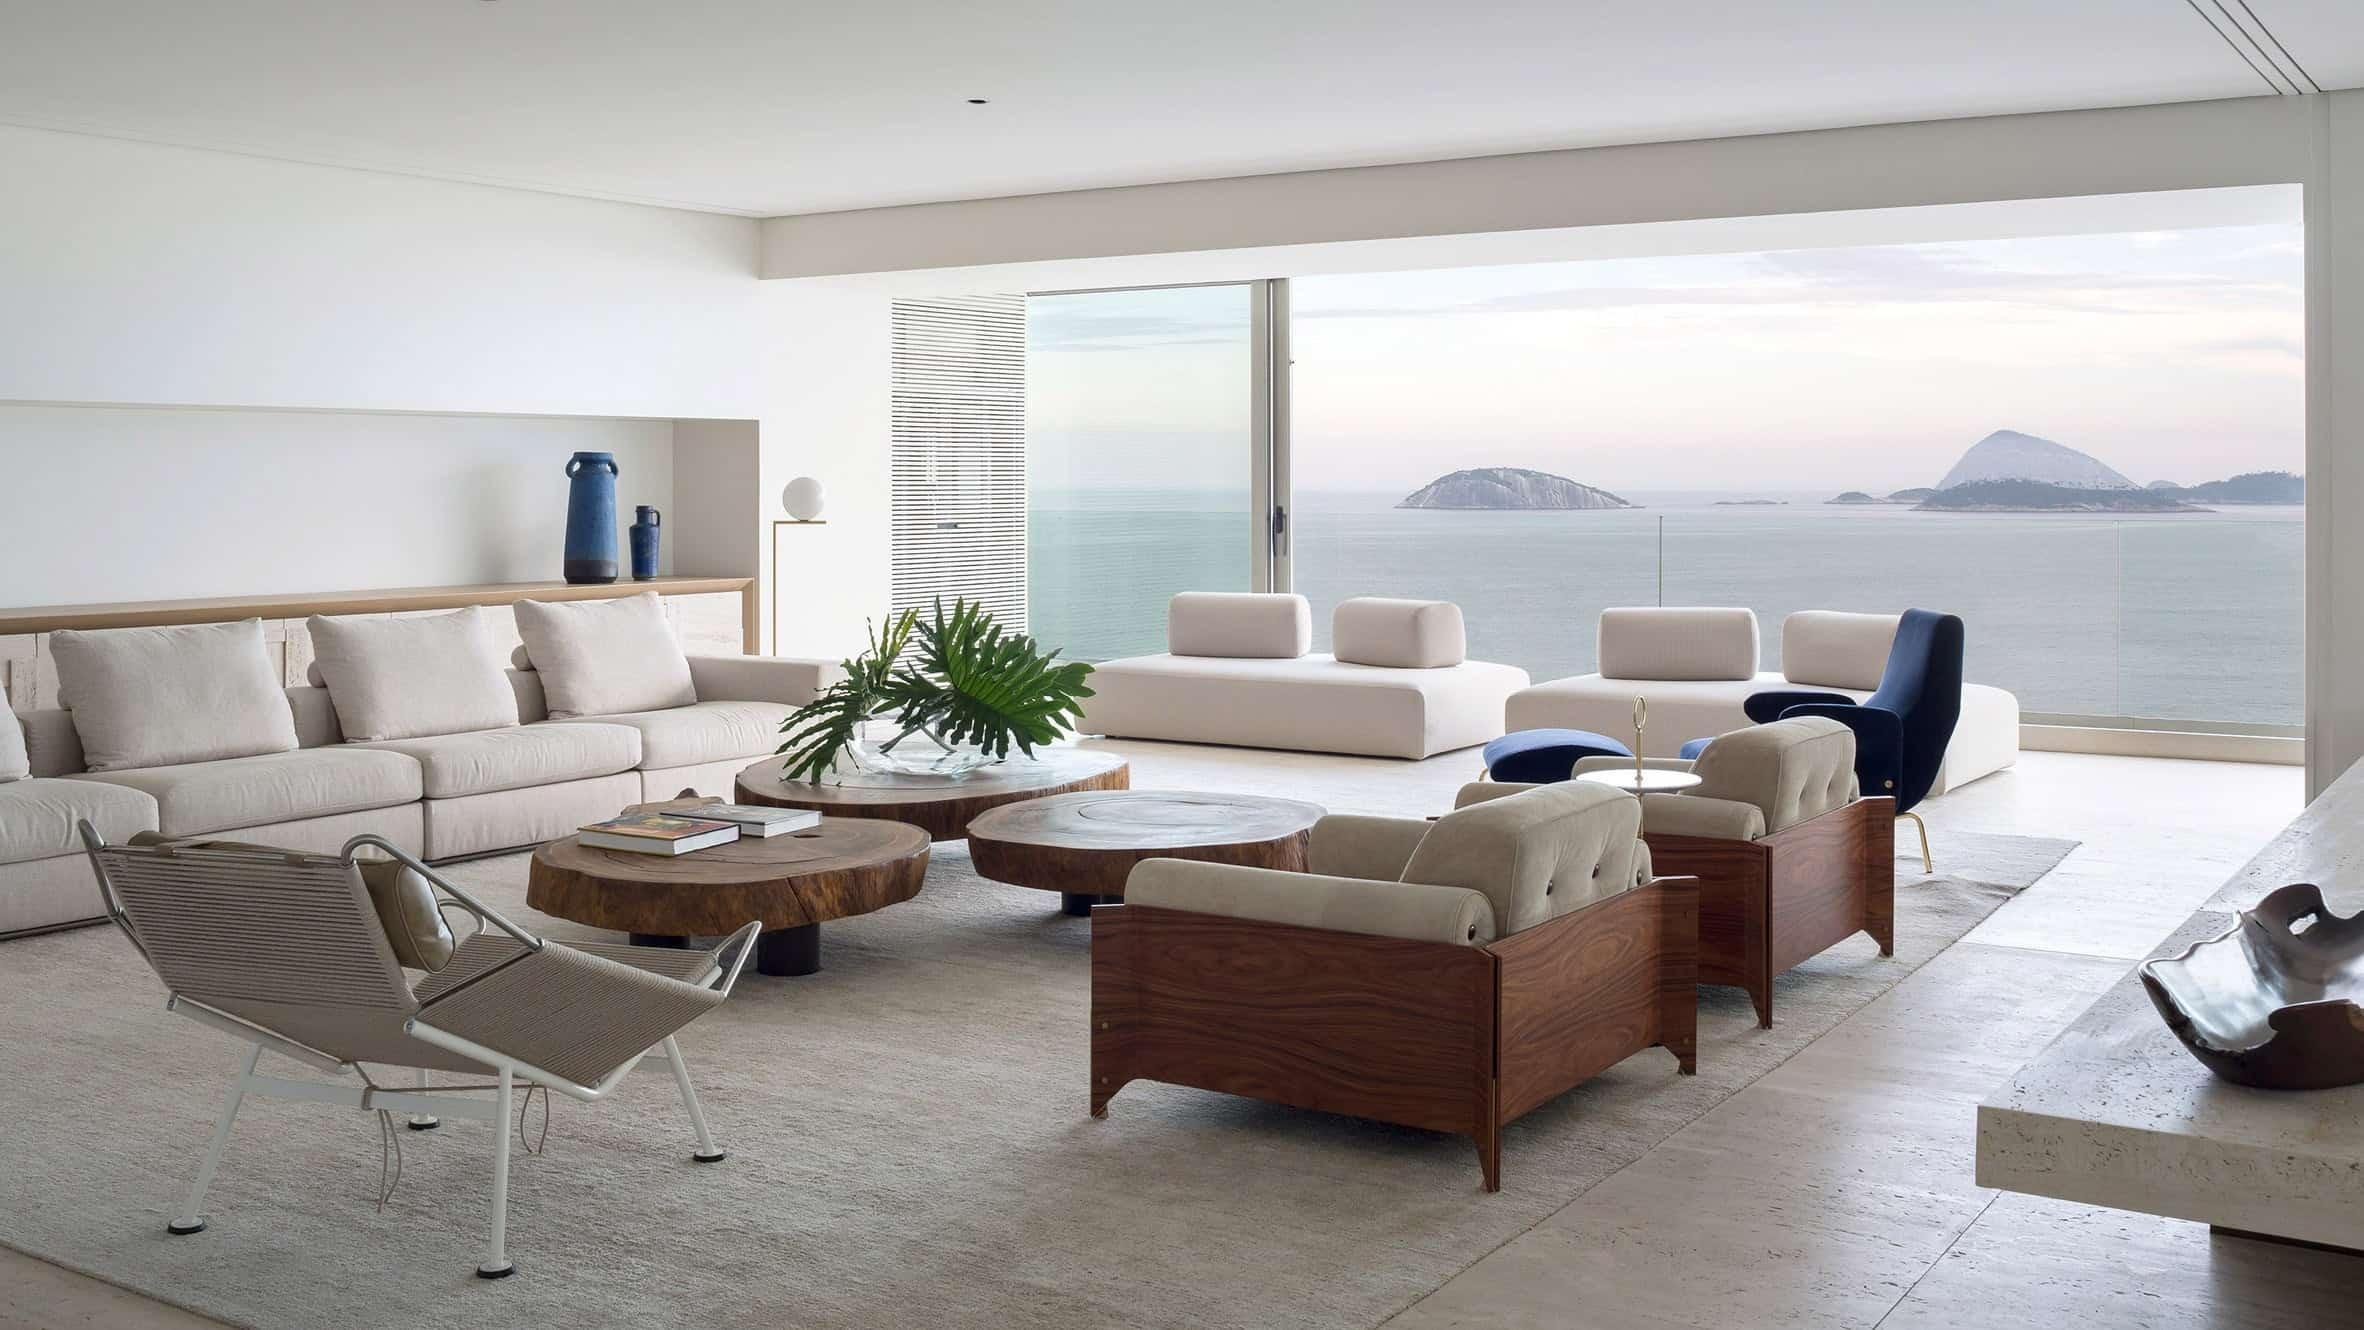 Prachtig appartement in Rio de Janeiro